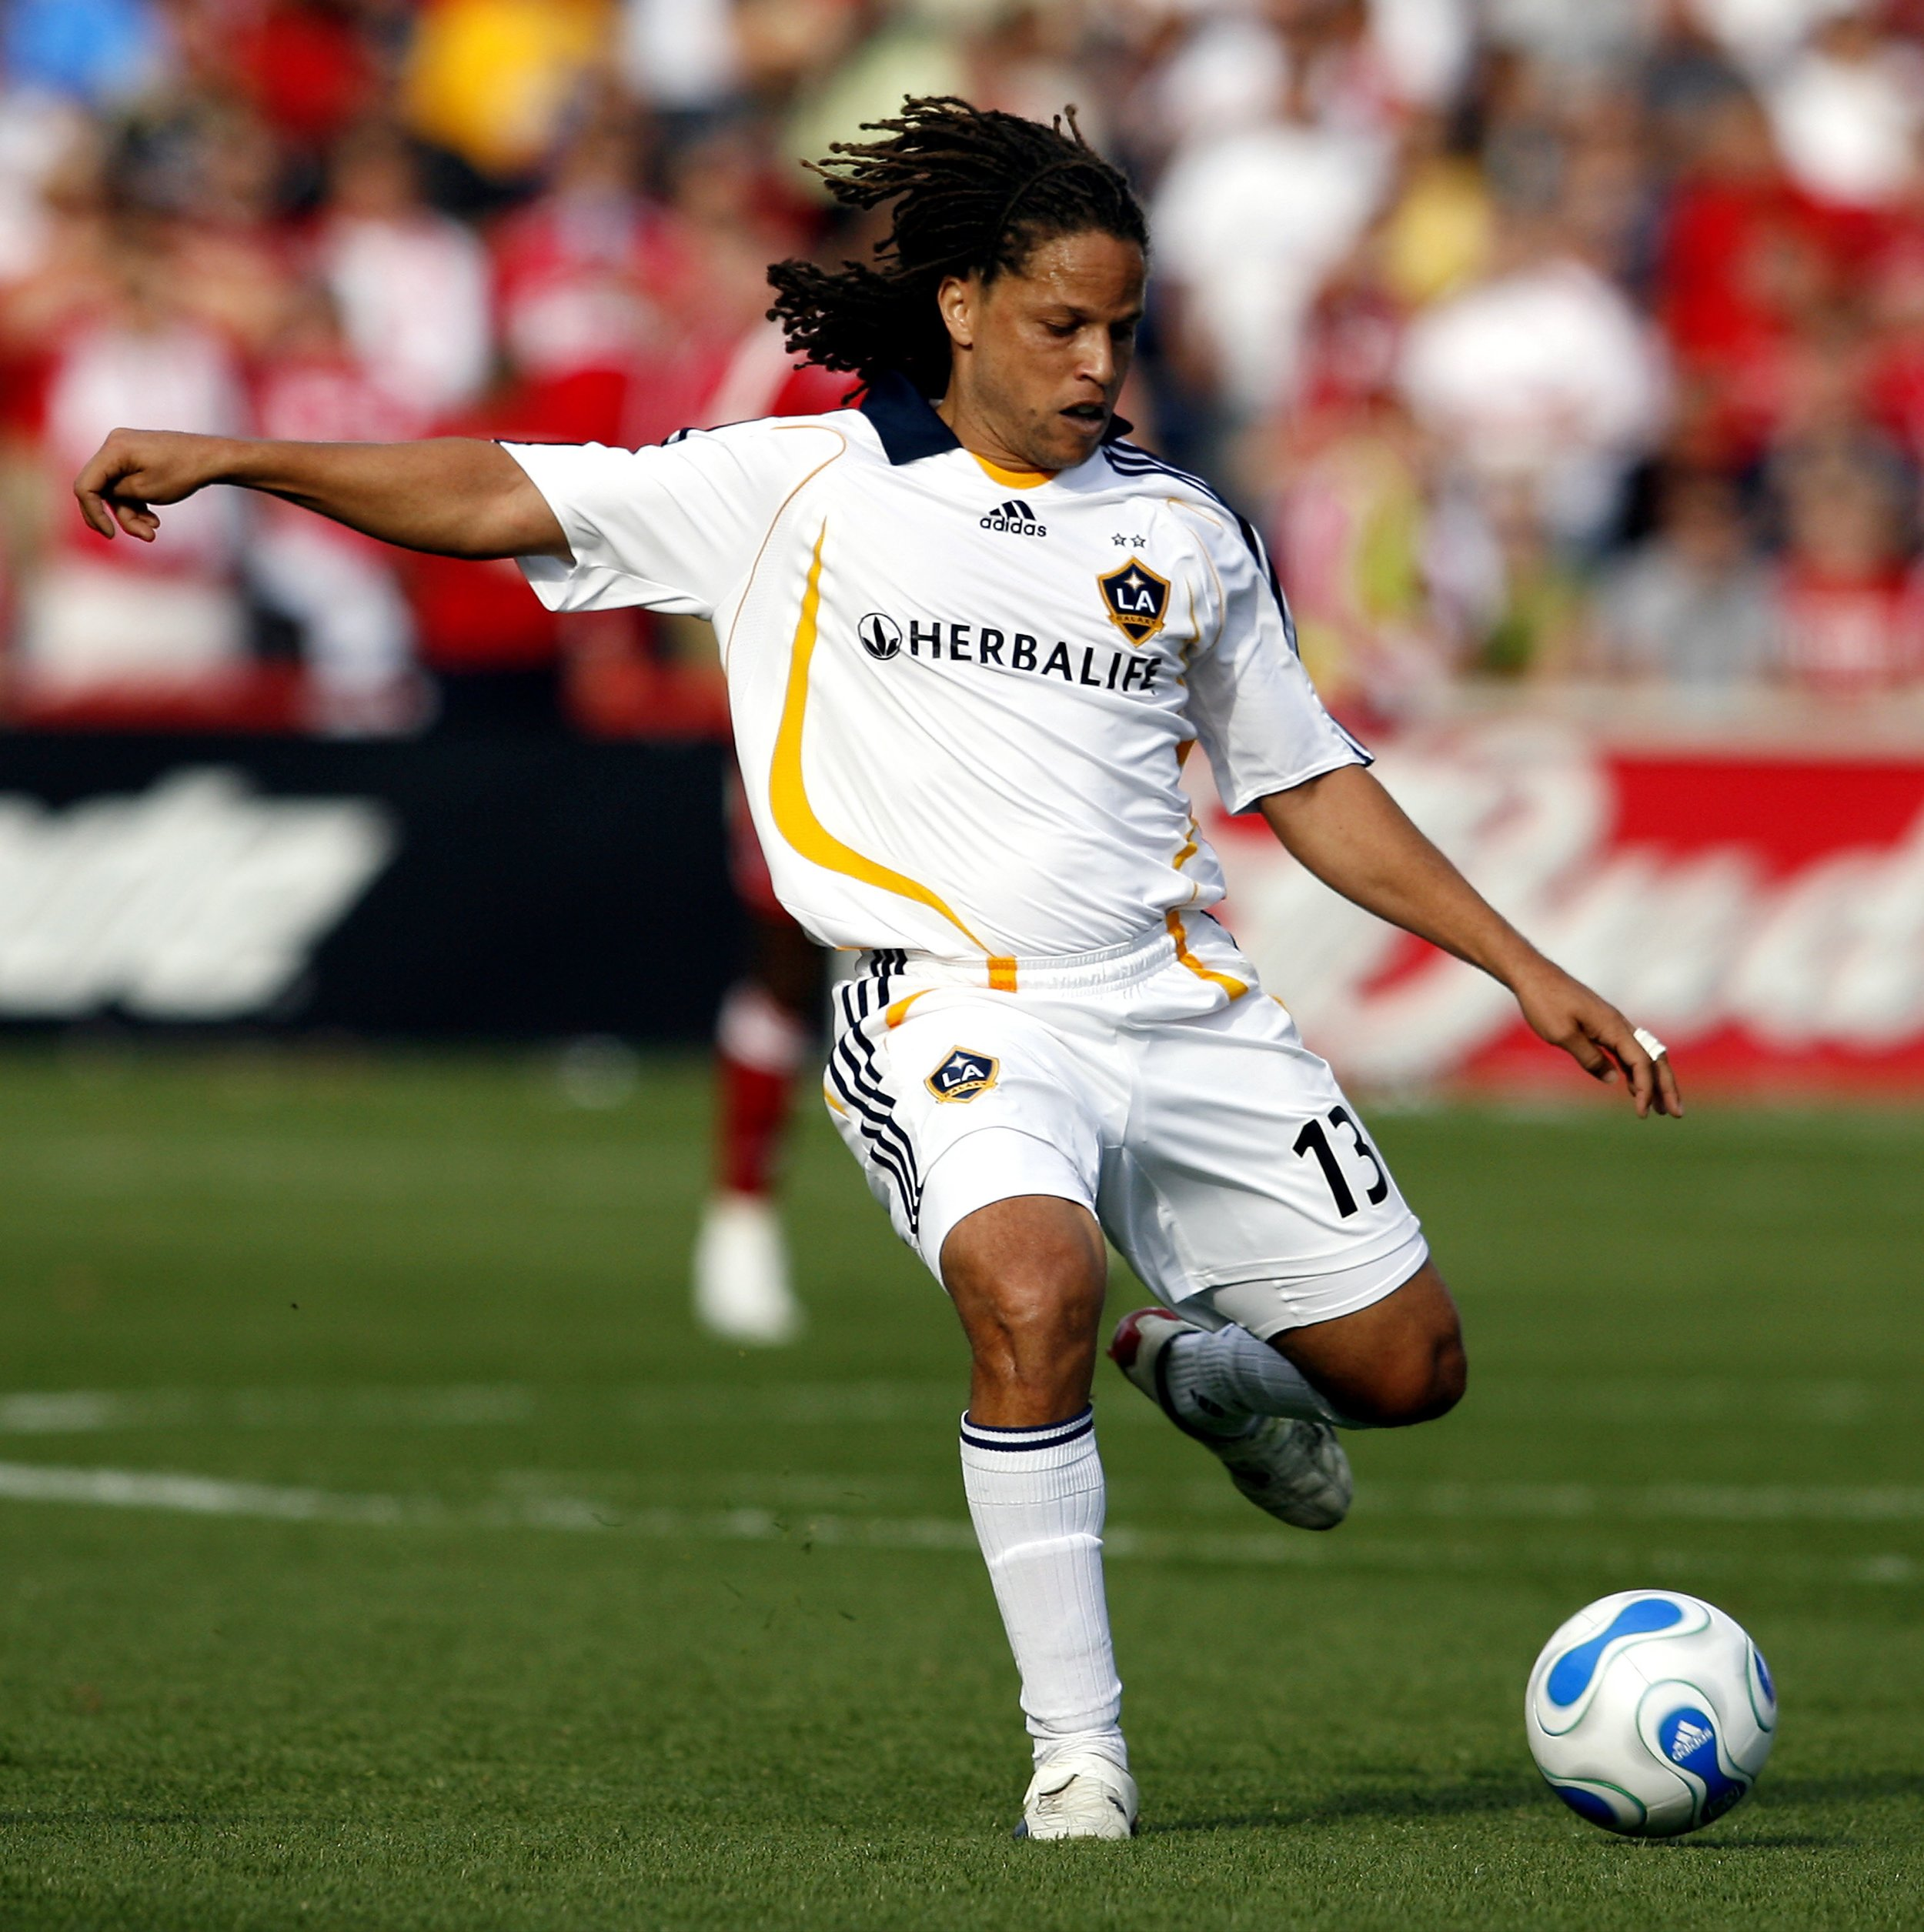 Cobi Jones, former MLS player.